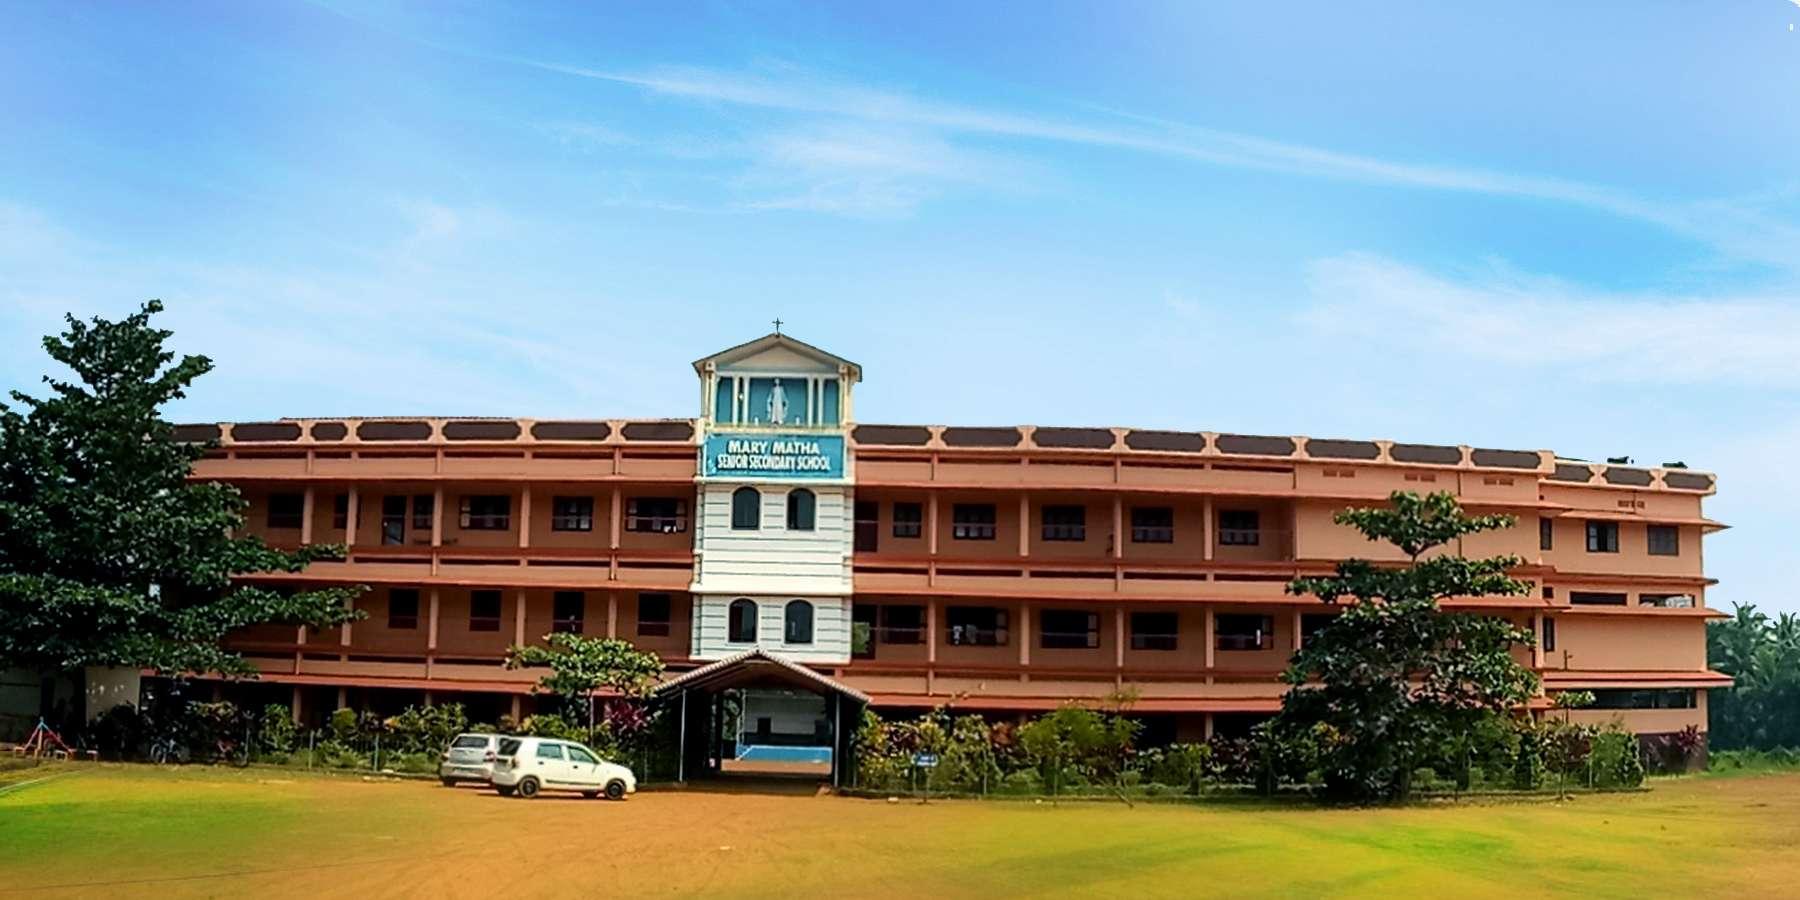 MARY MATHA ENGLISH SCHOOL PILATHARA PO MANDUR VIA KANNUR DISTT KERALA 930657